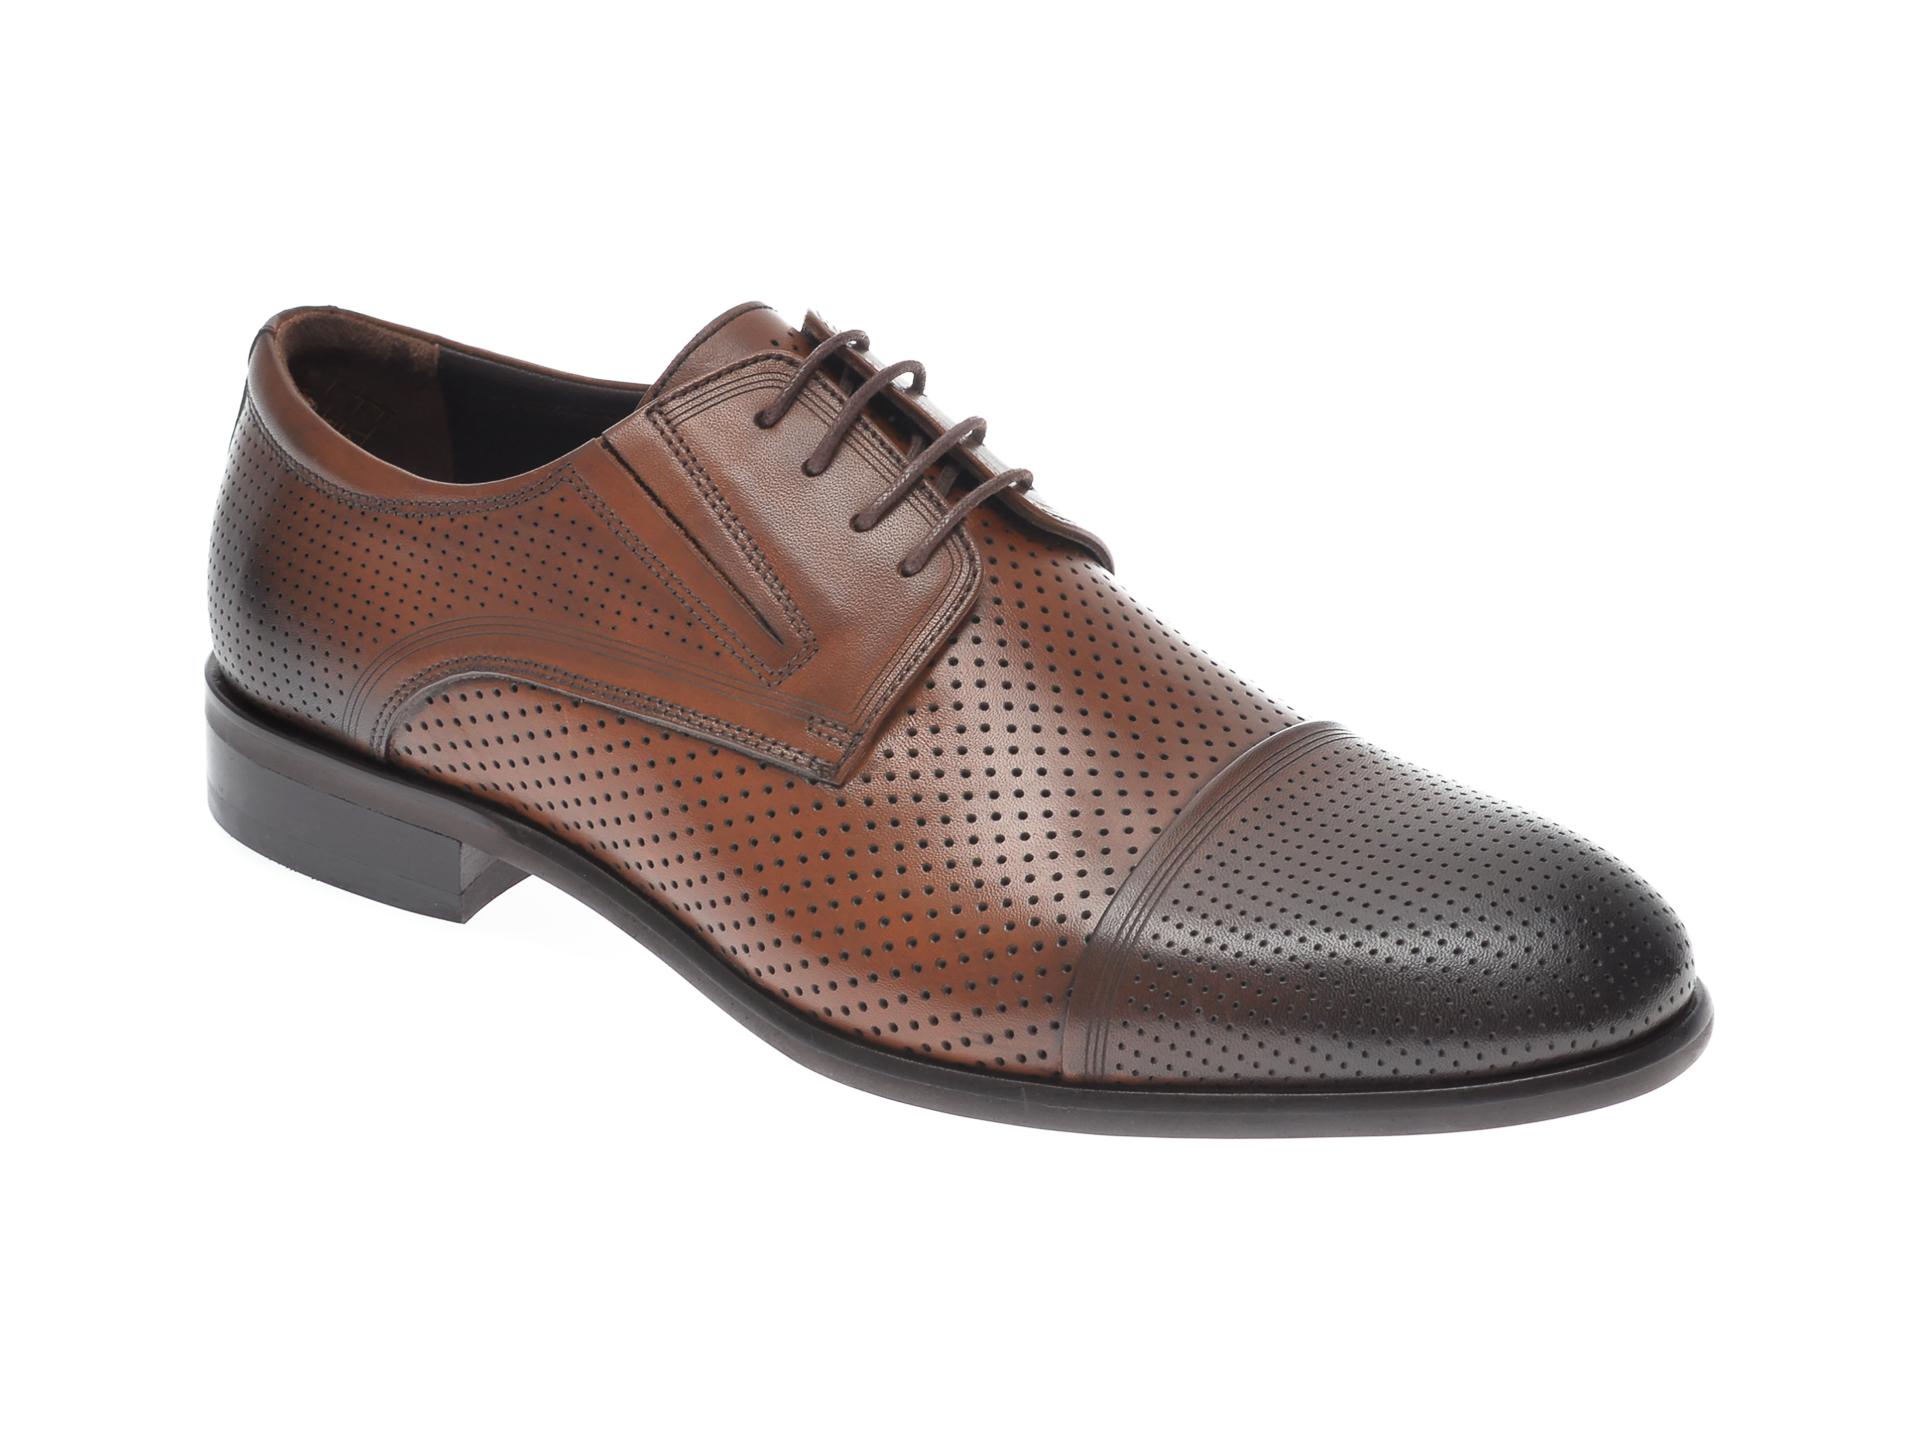 Pantofi OTTER maro, 7840, din piele naturala imagine